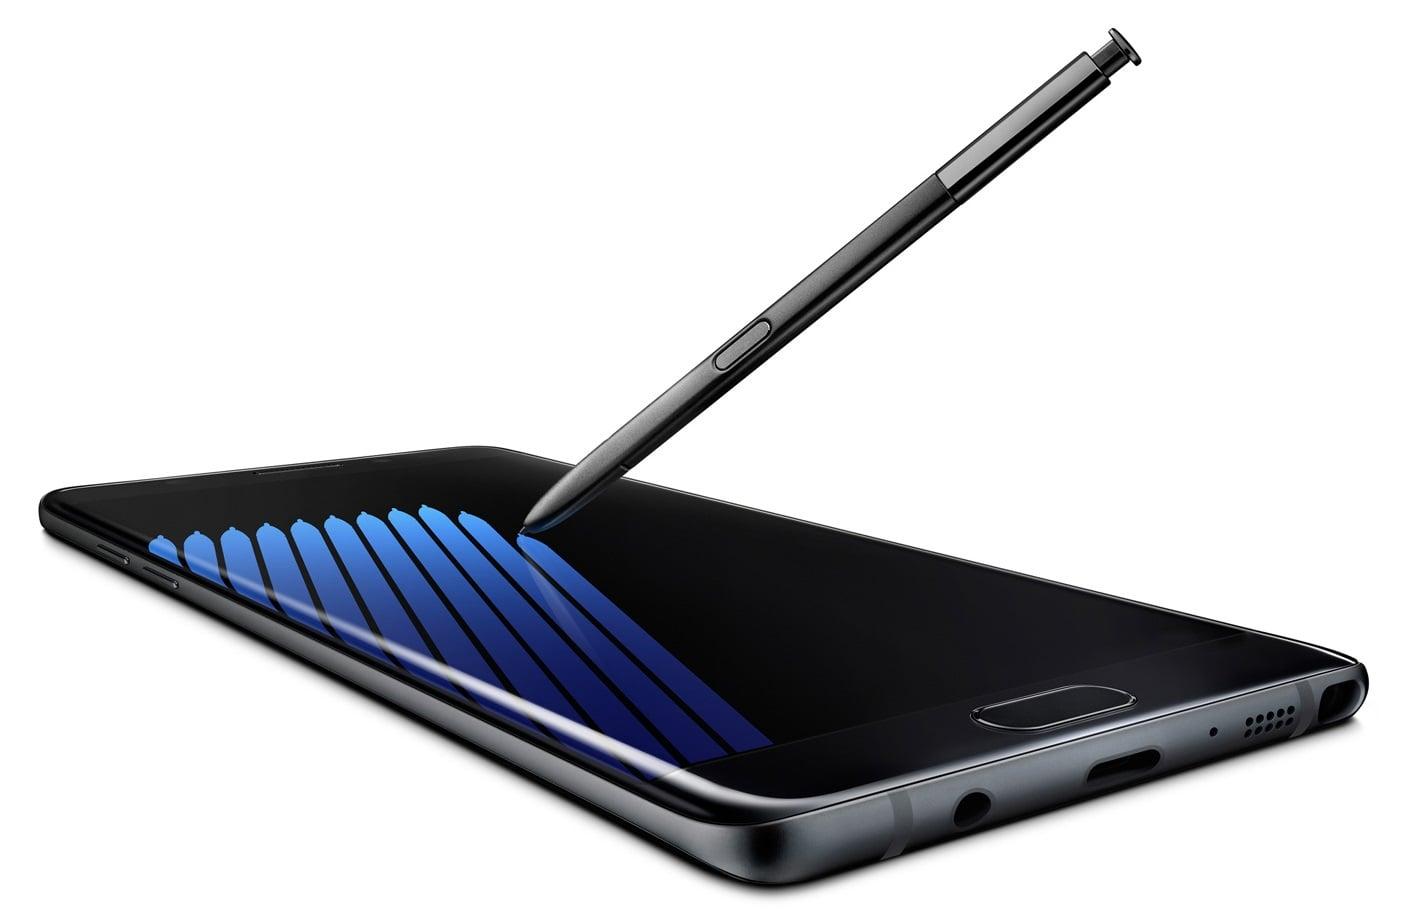 Galaxy Note 7 bez logo Samsunga